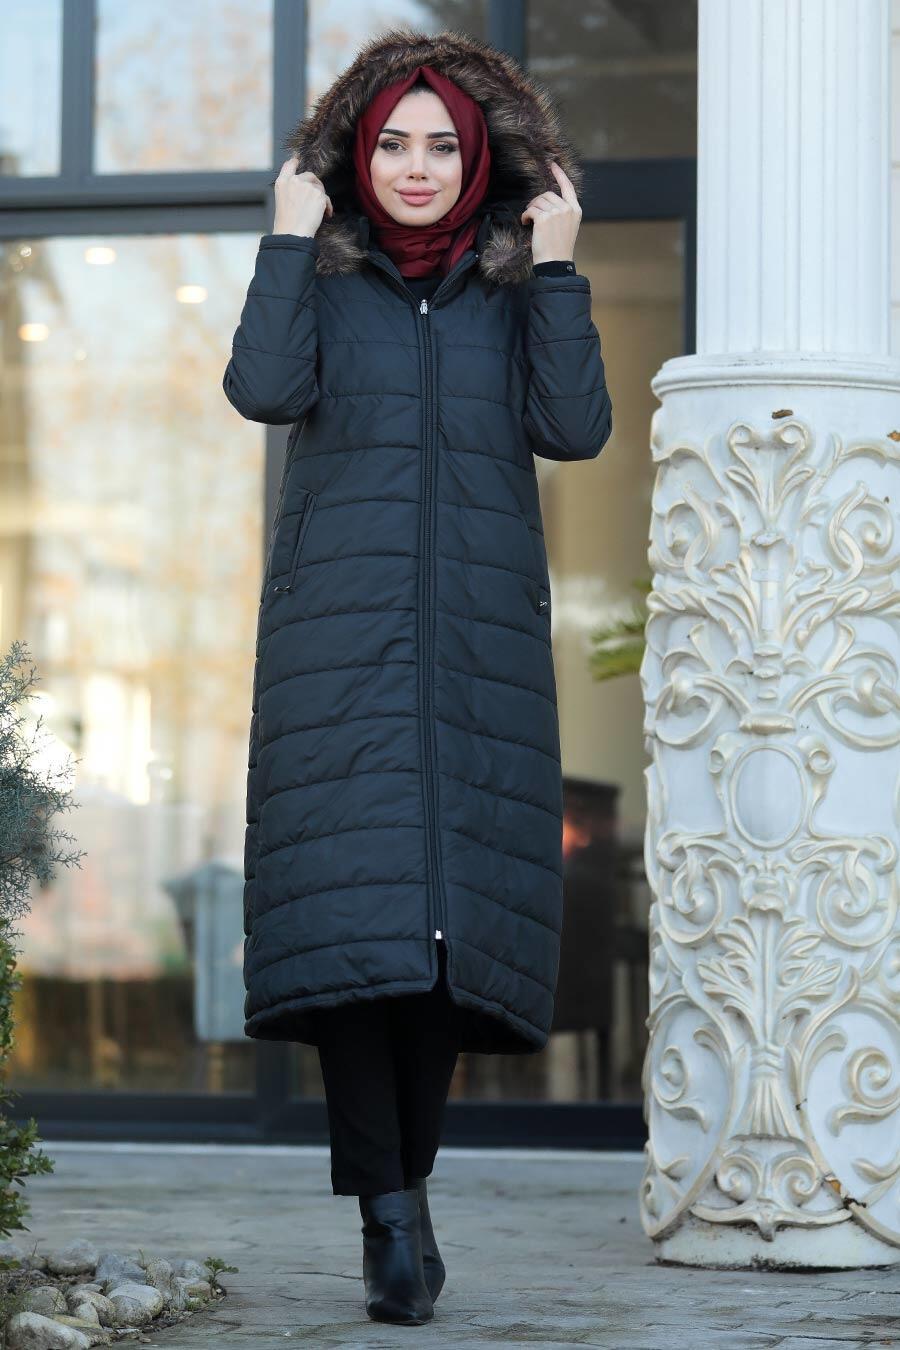 Neva Style - Black İnflatable Coat 9050S